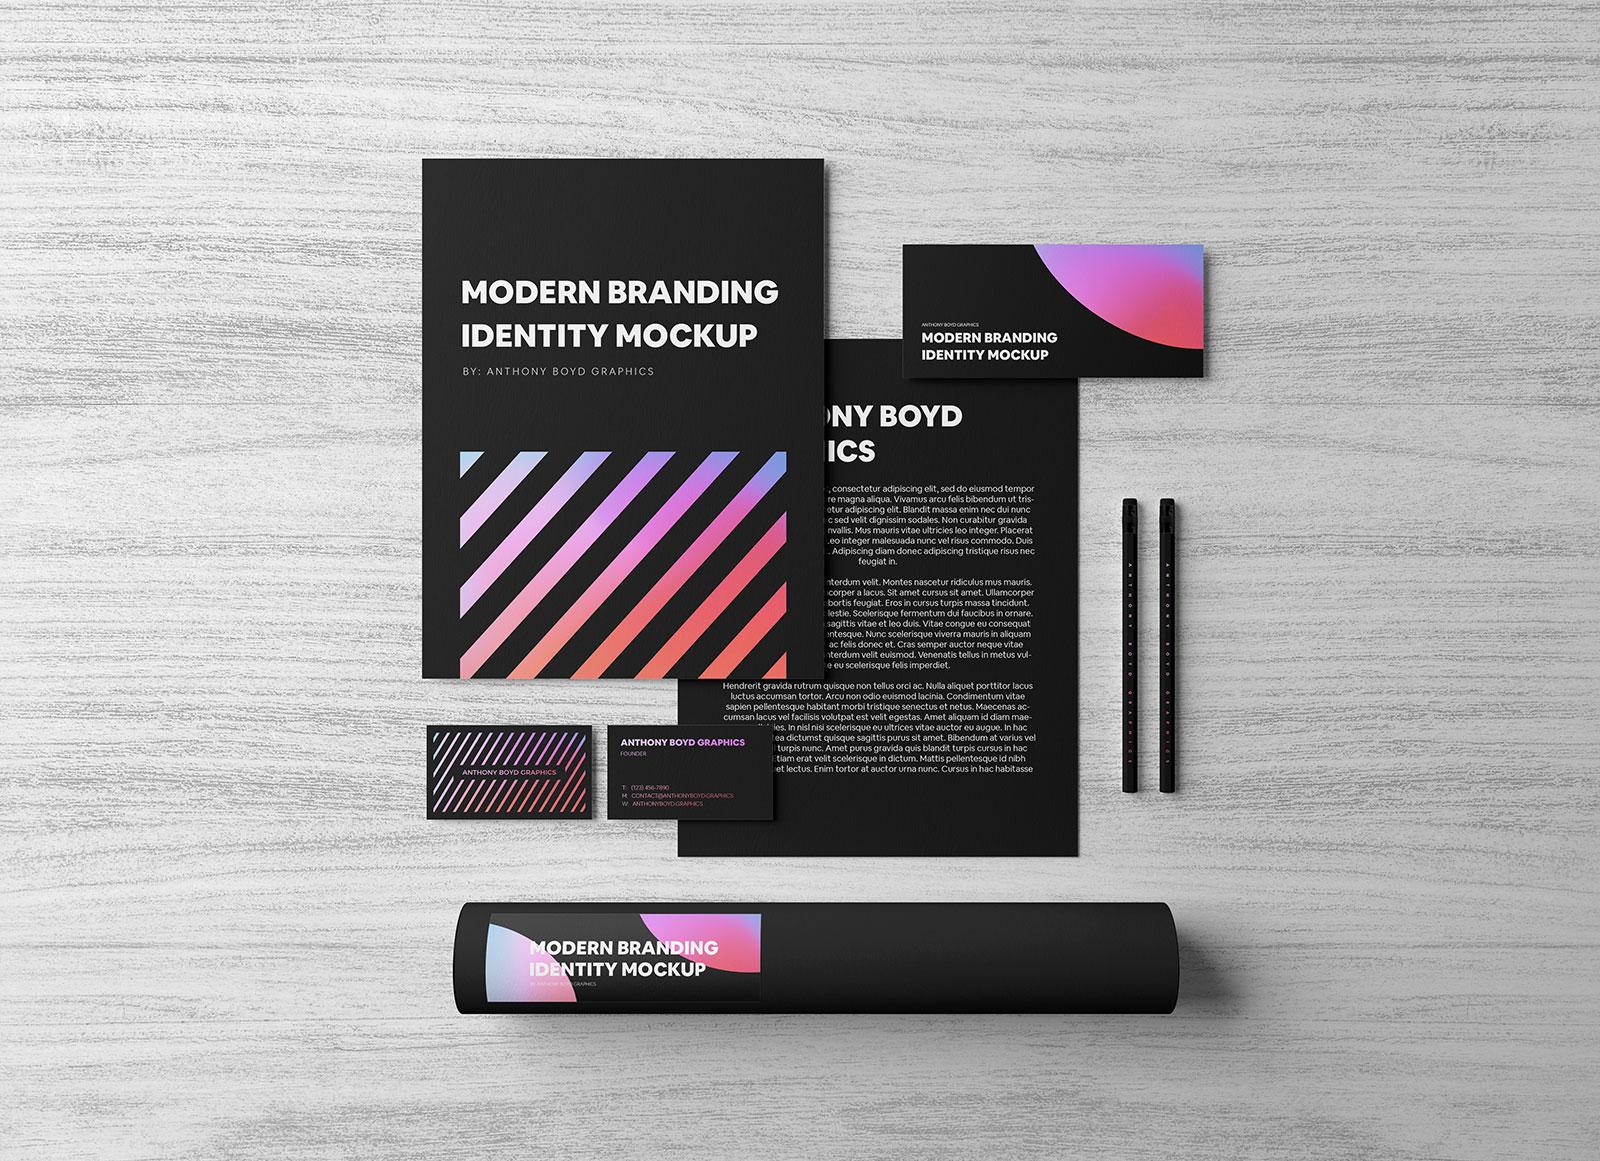 Free Black Stationery Corporate Brand Identity Mockup PSD